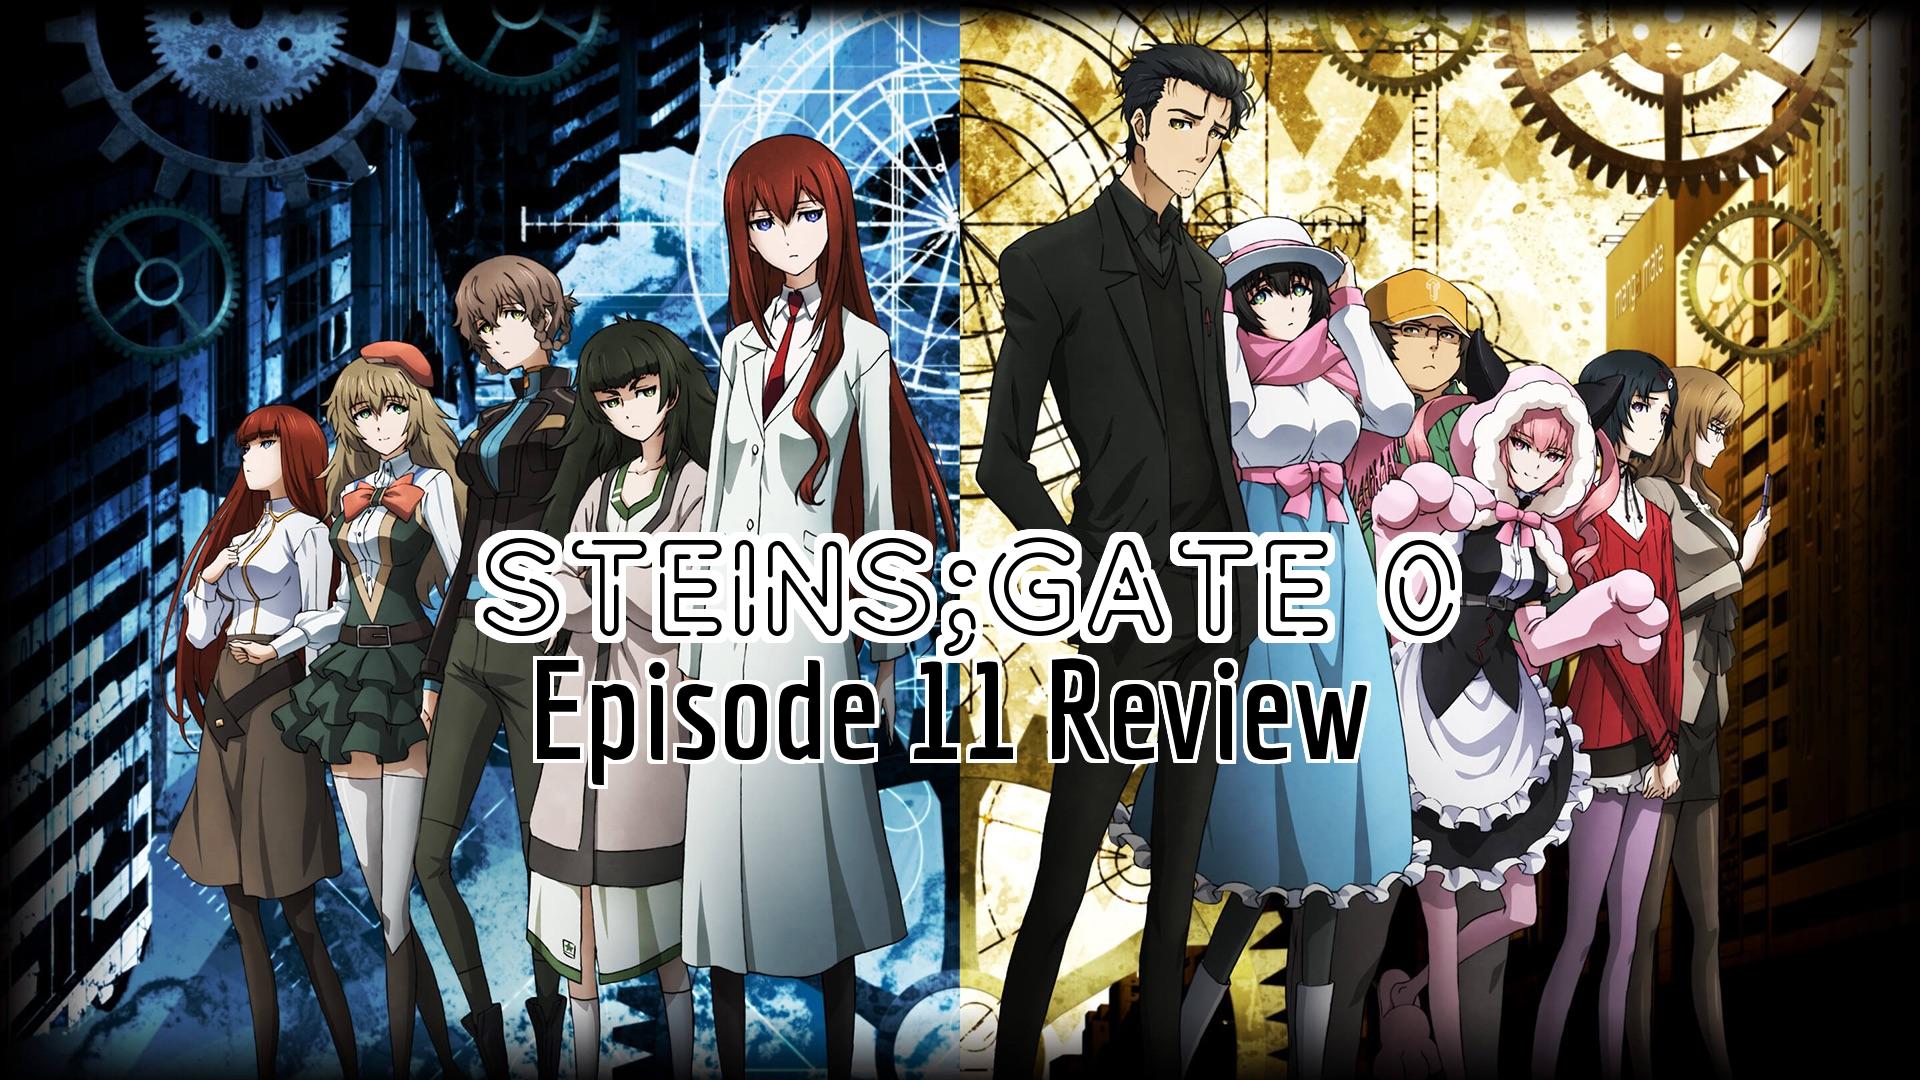 Steins;Gate 0 Episode 11 – Anime QandA Review